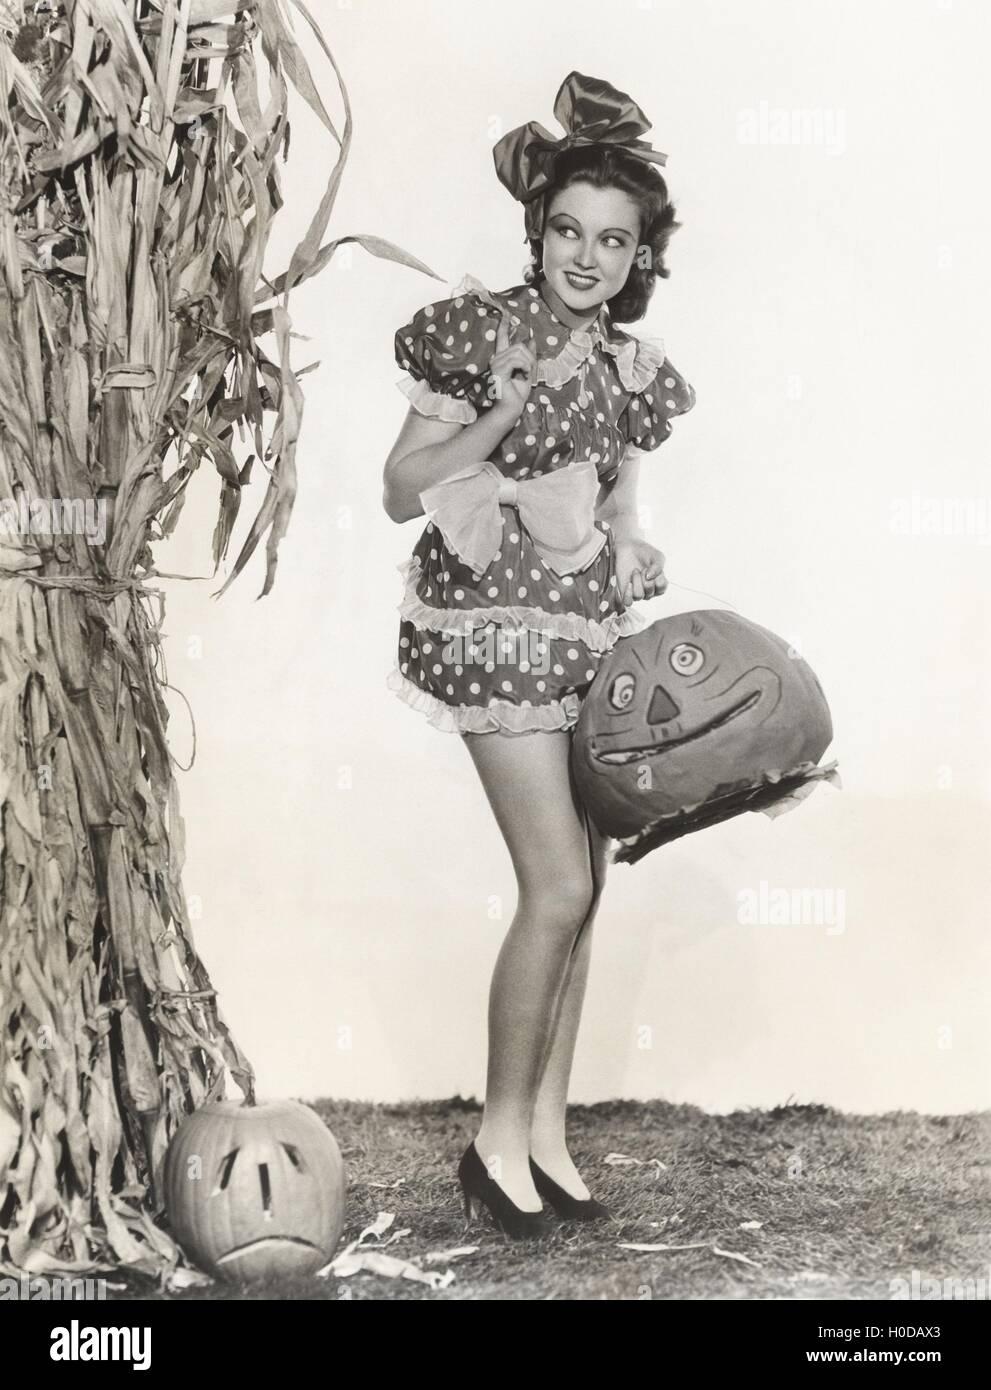 Woman in short polka dot dress in front of cornstalk carrying pumpkin - Stock Image